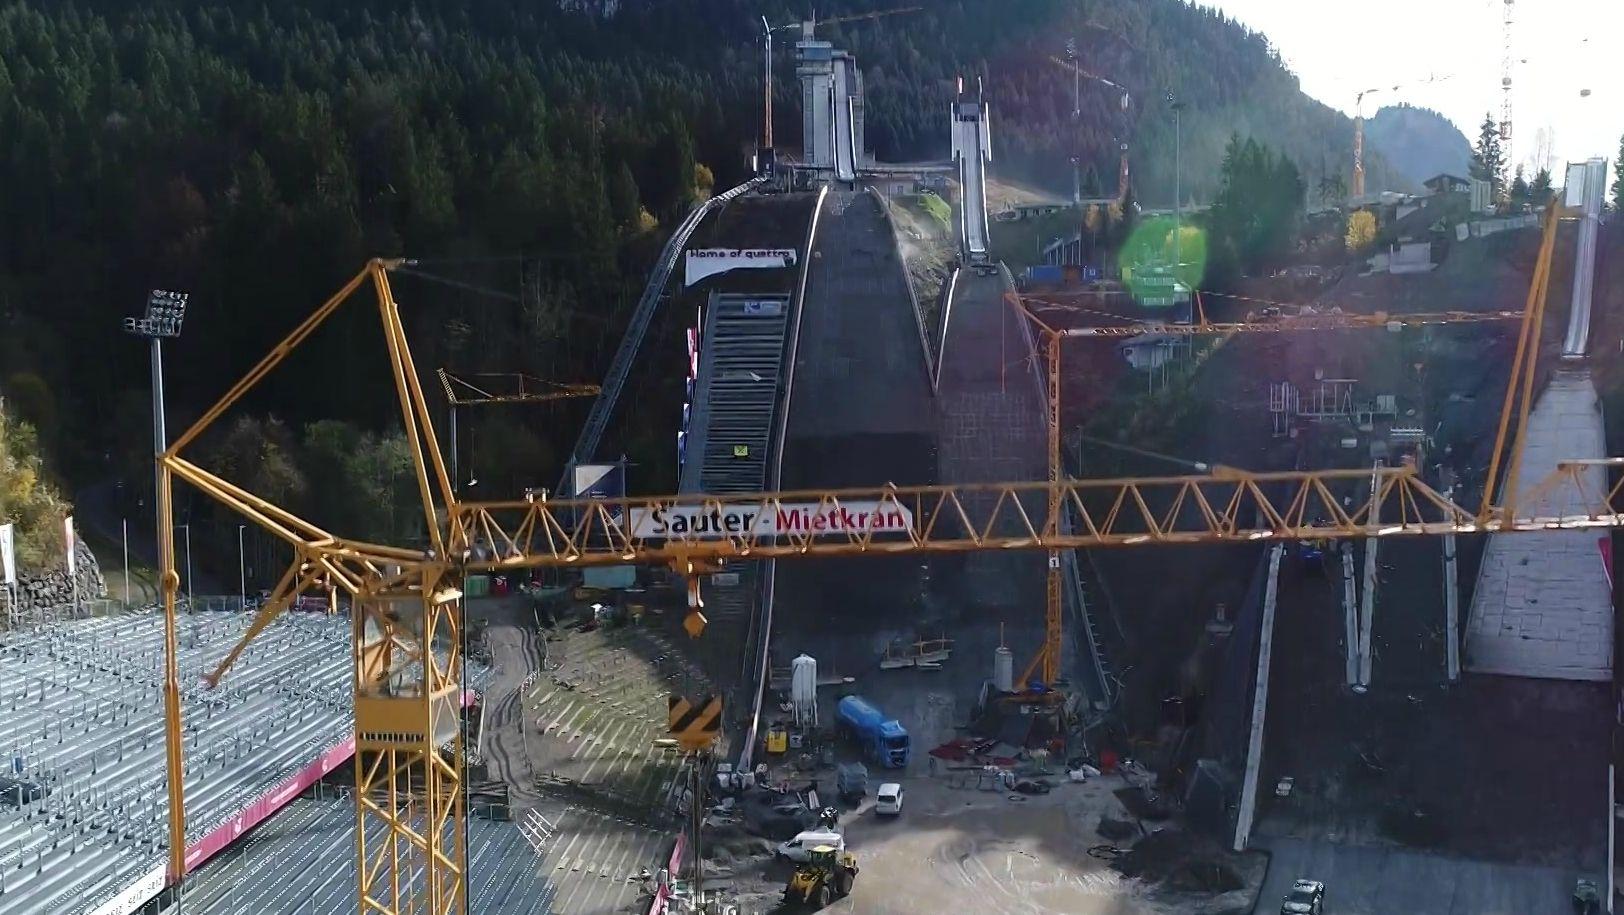 Baustelle in Oberstdorf